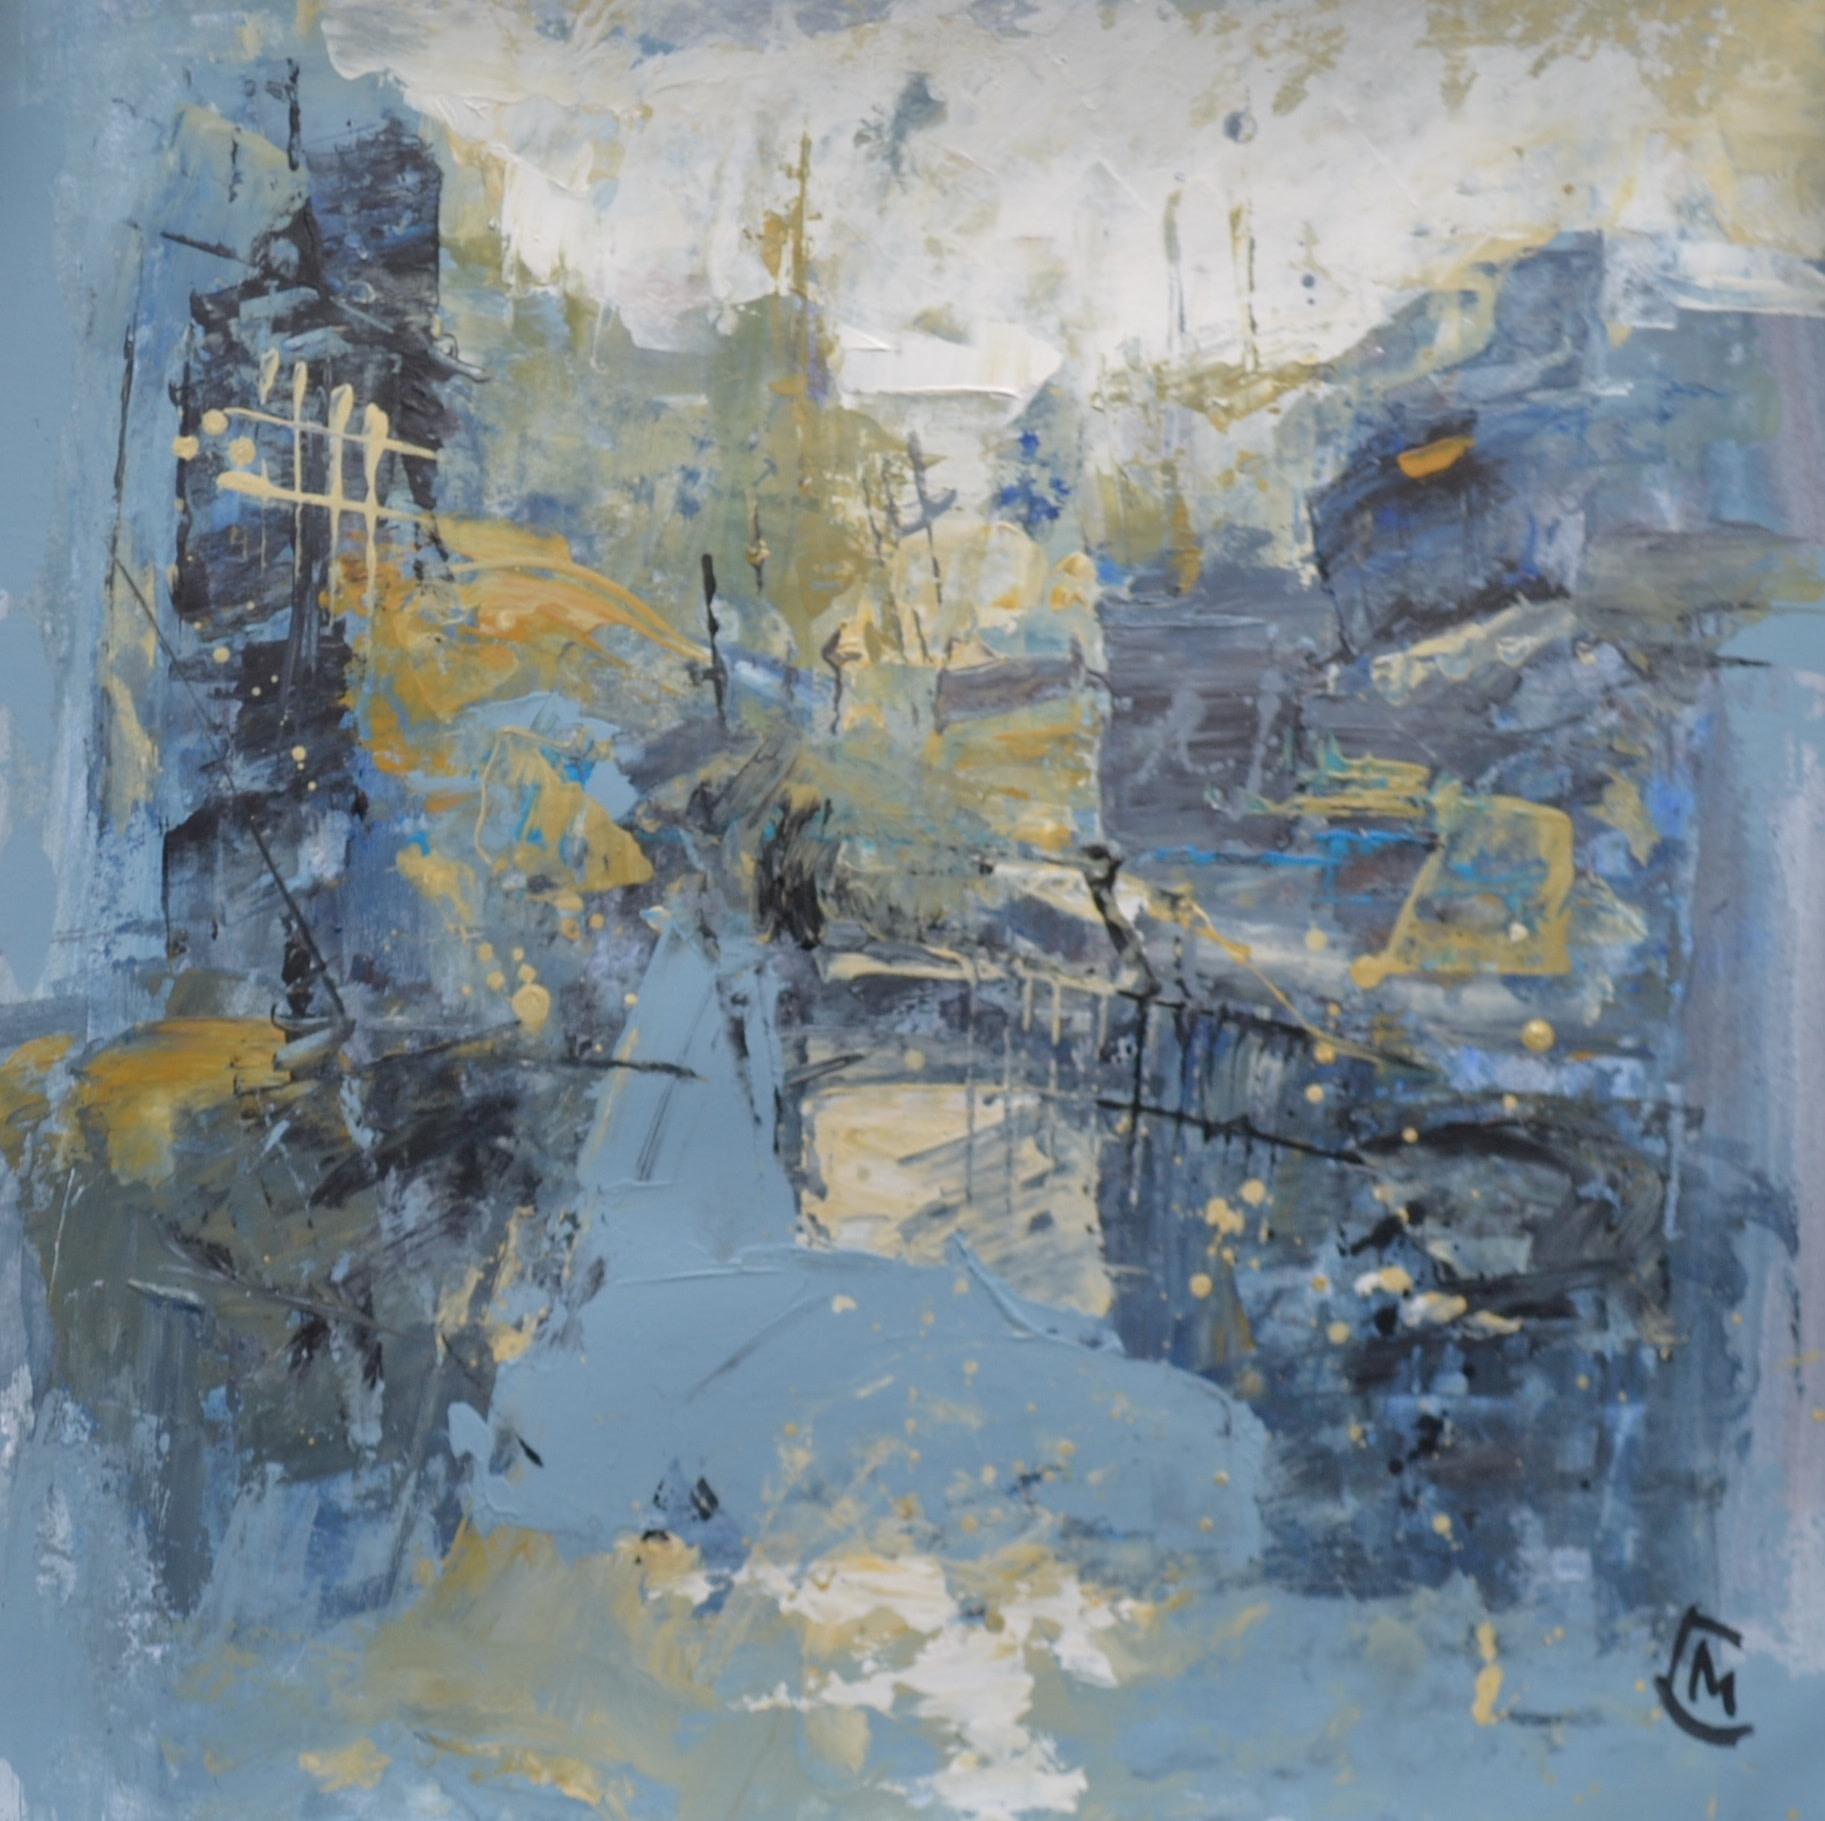 <span class=&#34;link fancybox-details-link&#34;><a href=&#34;/exhibitions/24/works/artworks_standalone10743/&#34;>View Detail Page</a></span><div class=&#34;artist&#34;><span class=&#34;artist&#34;><strong>Colin Merrin</strong></span></div><div class=&#34;title&#34;><em>Composition 210</em></div><div class=&#34;medium&#34;>acrylic</div><div class=&#34;dimensions&#34;>38x38cm</div>